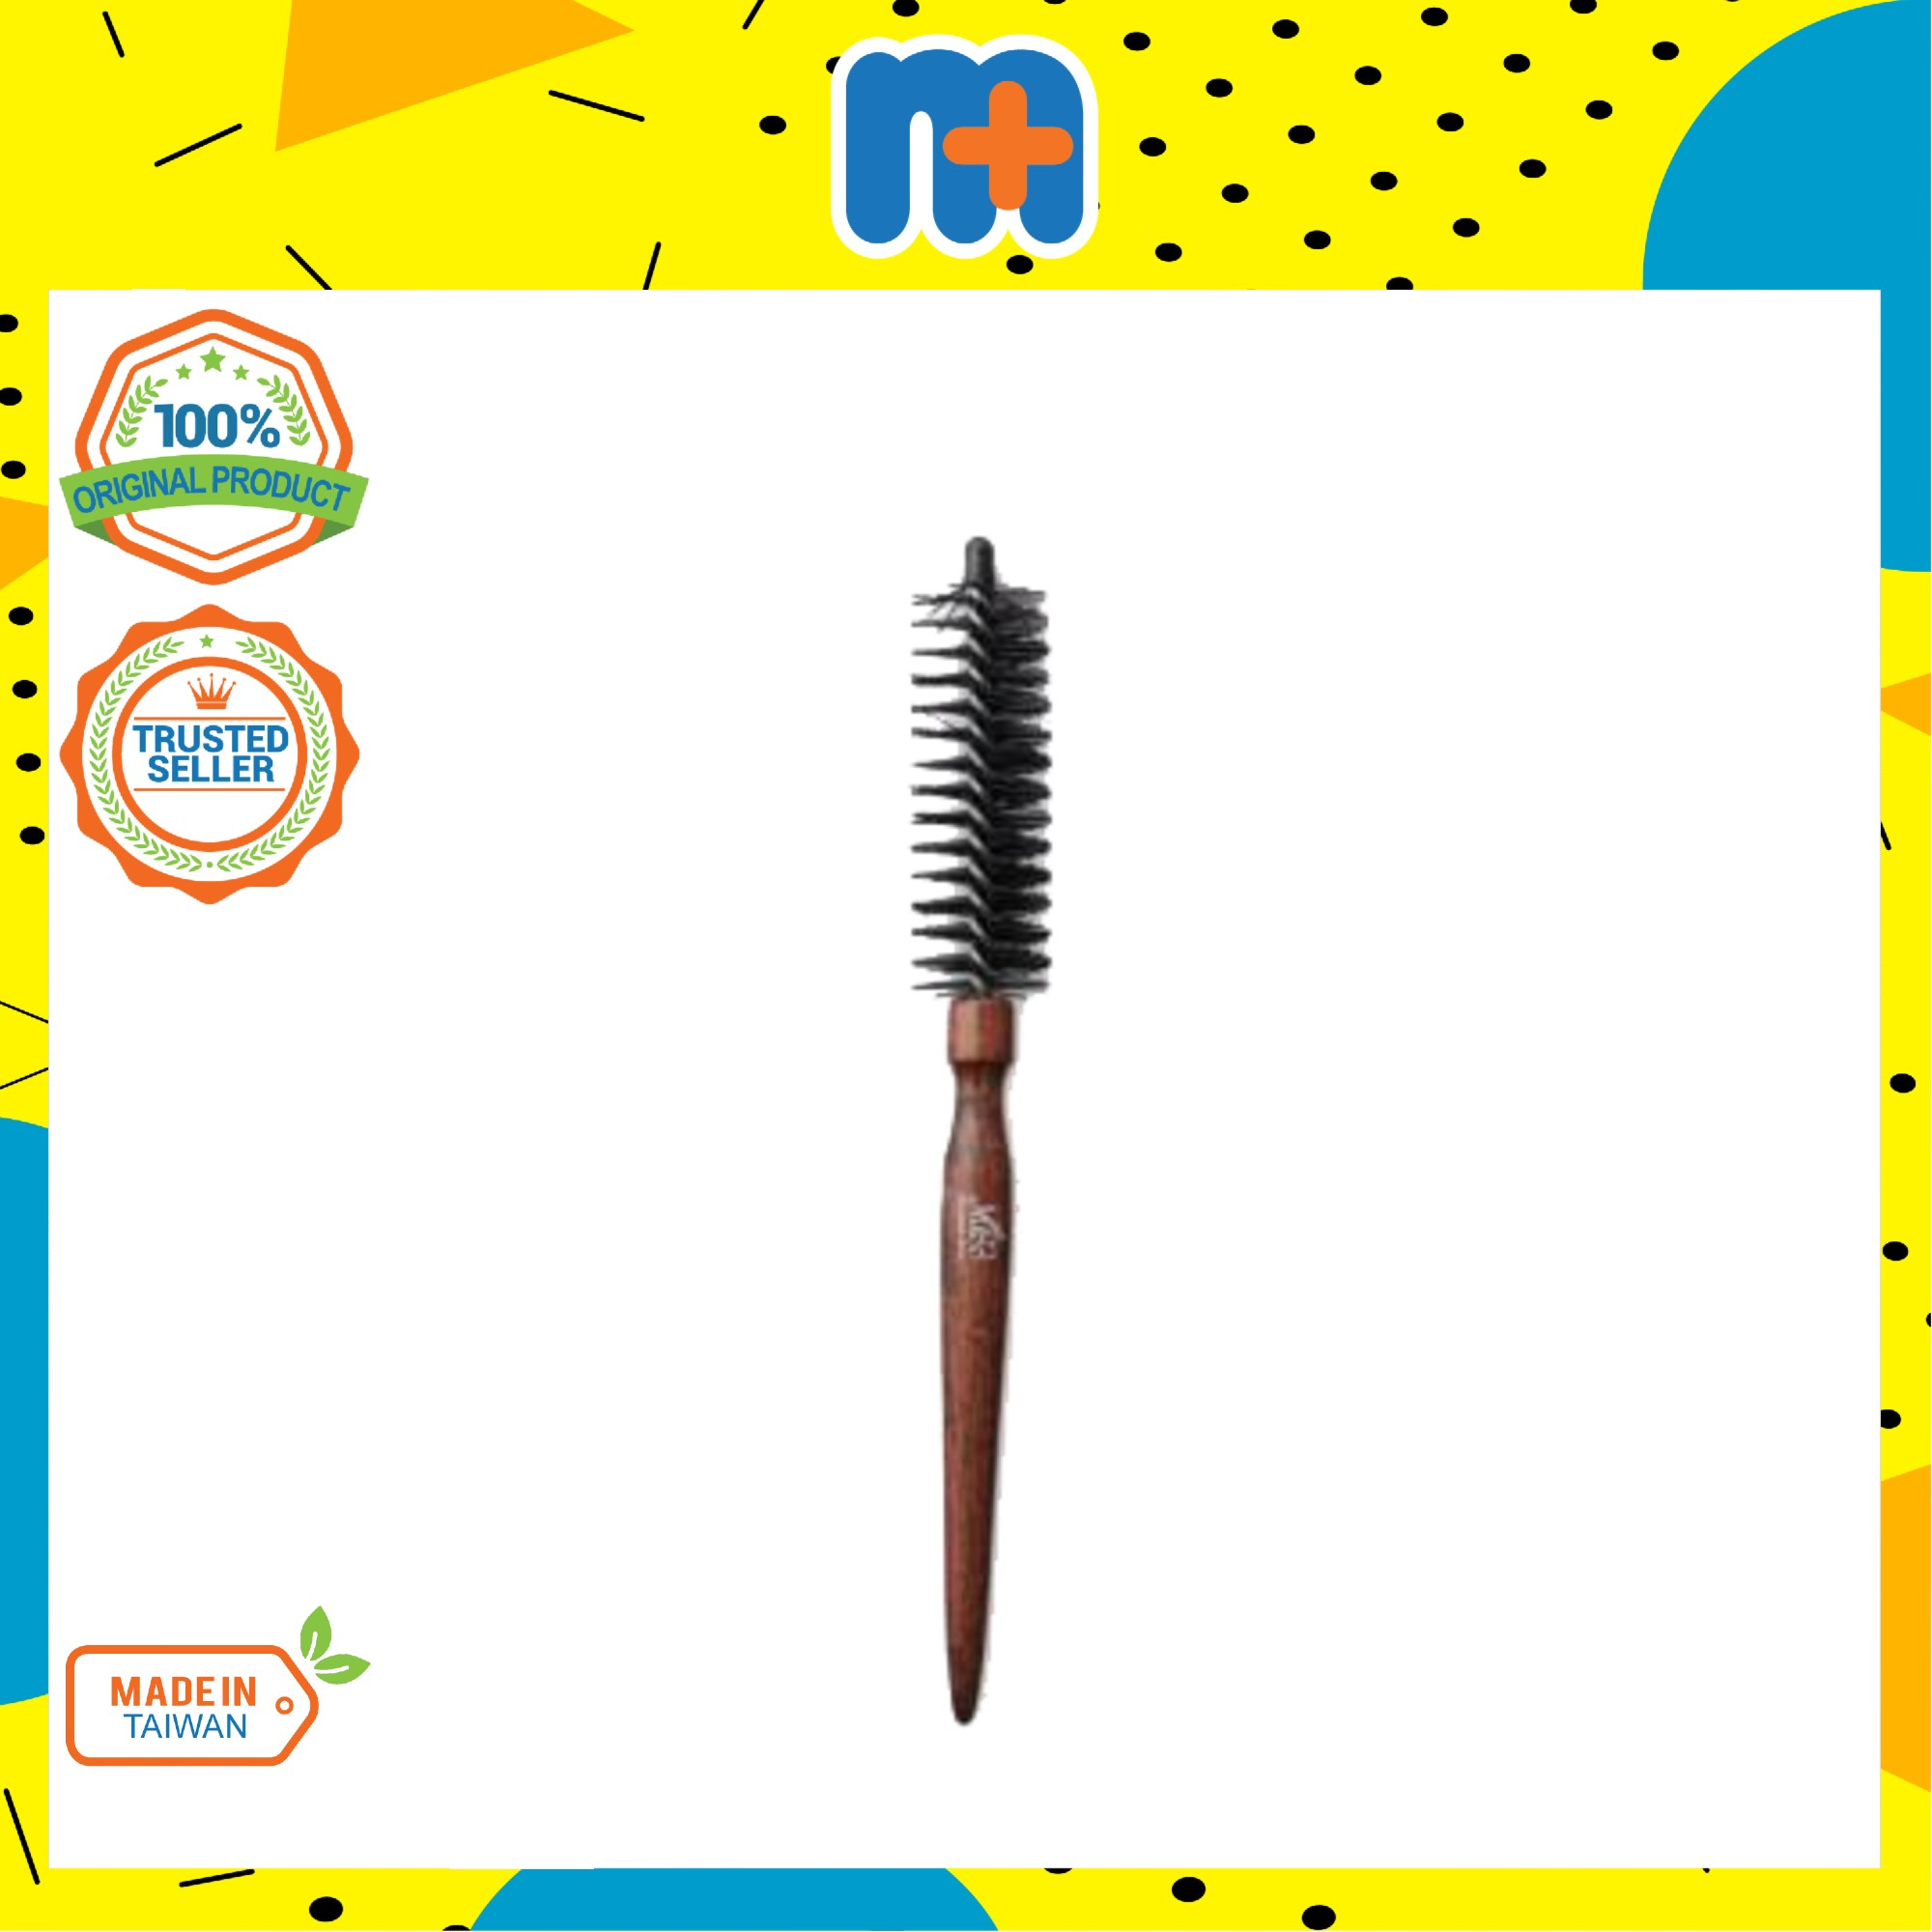 [MPLUS] Pf Life Comb Brush